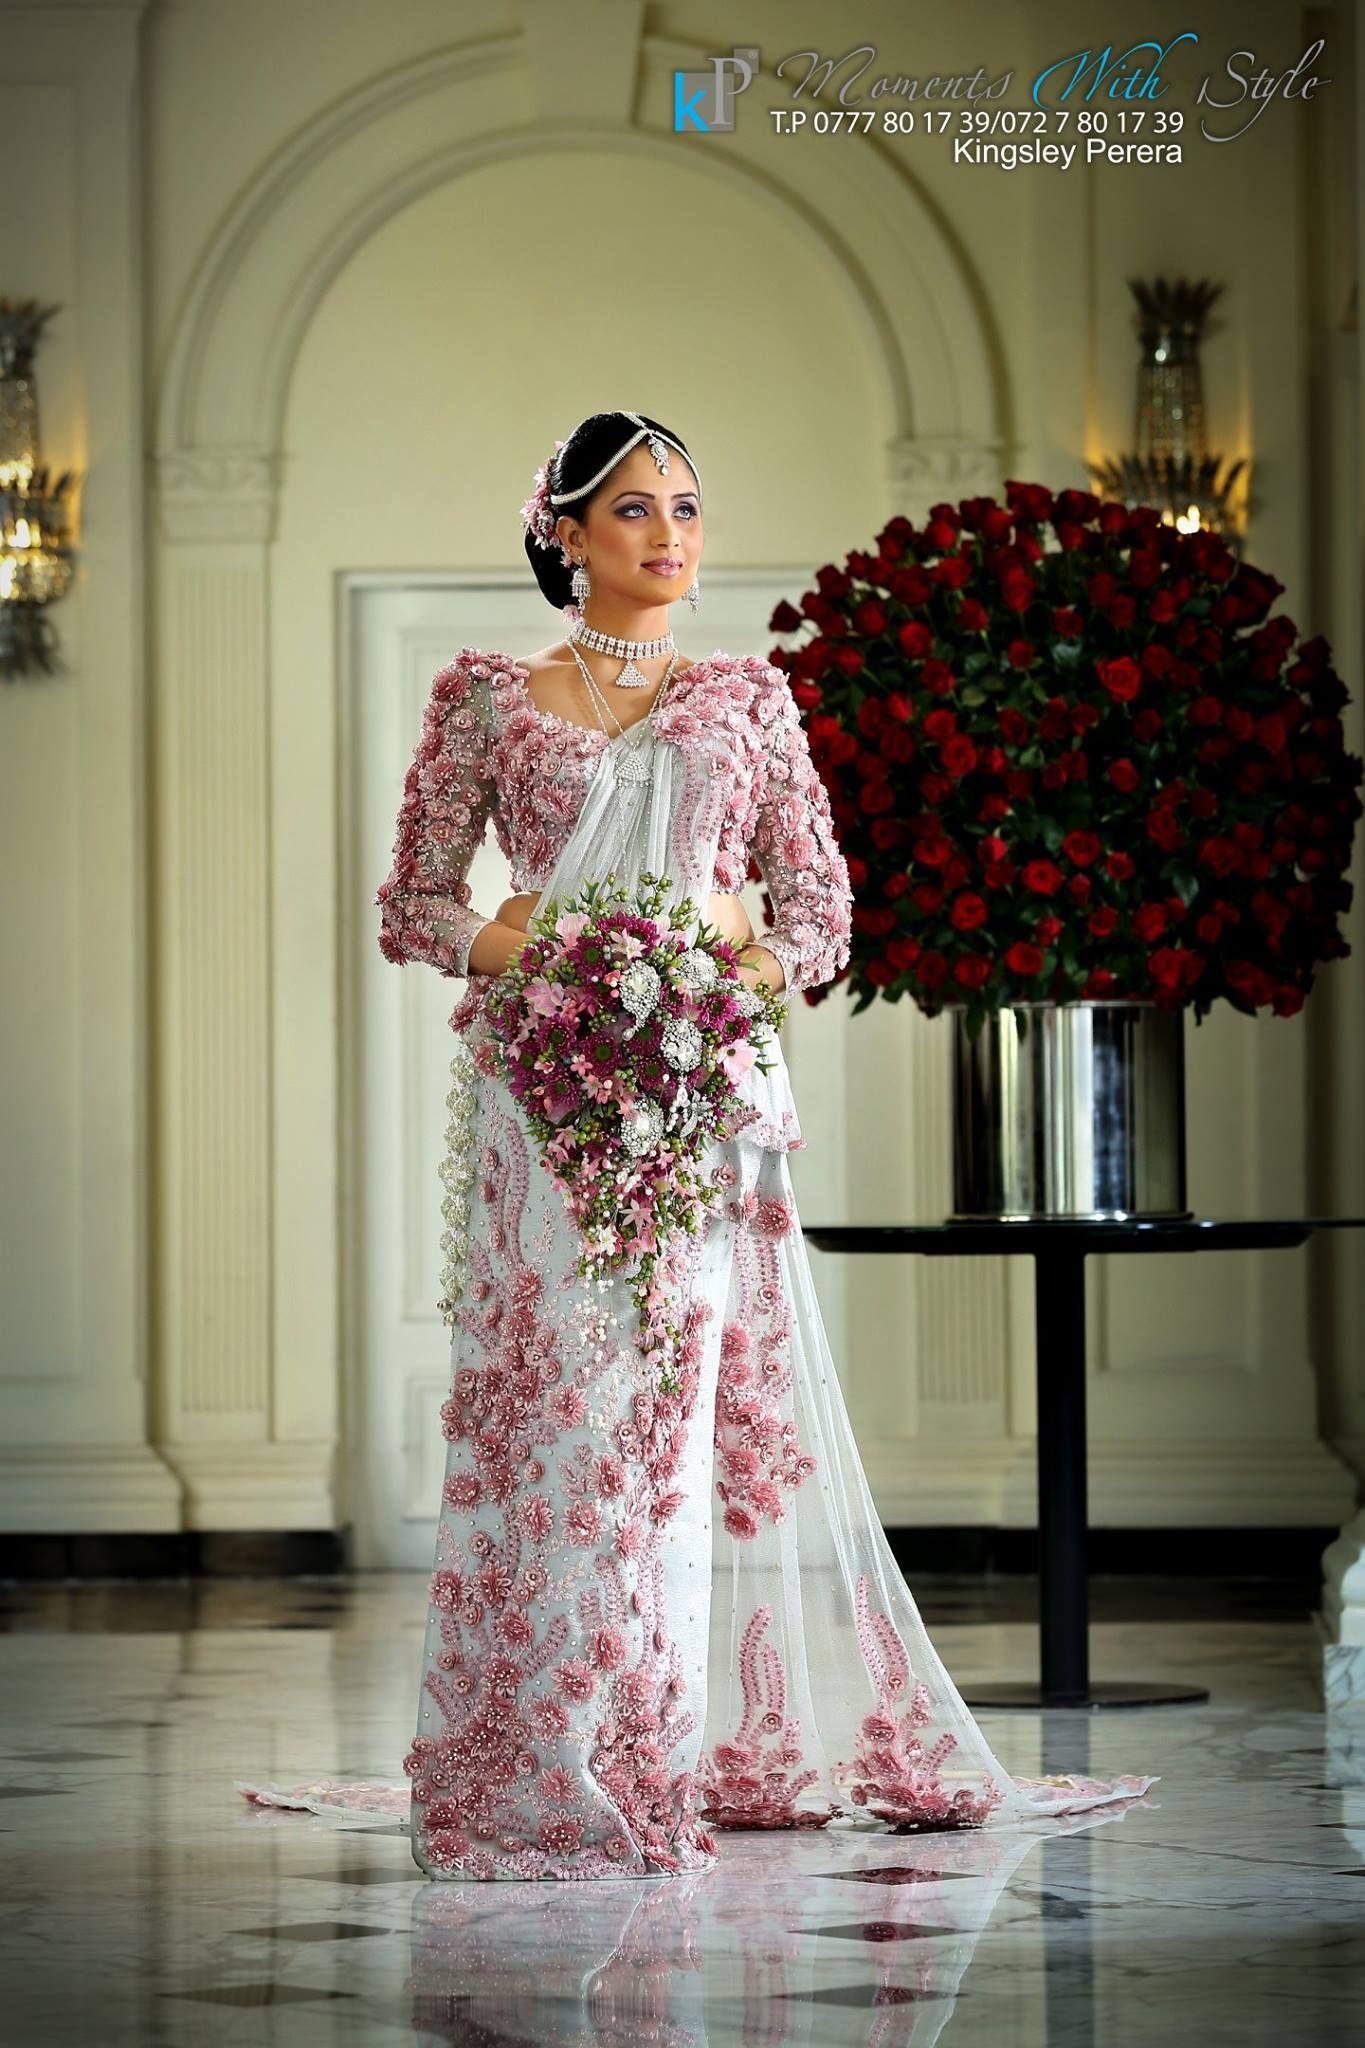 Bridesmaid saree image by Vinil Chokomilk on Sri Lankan